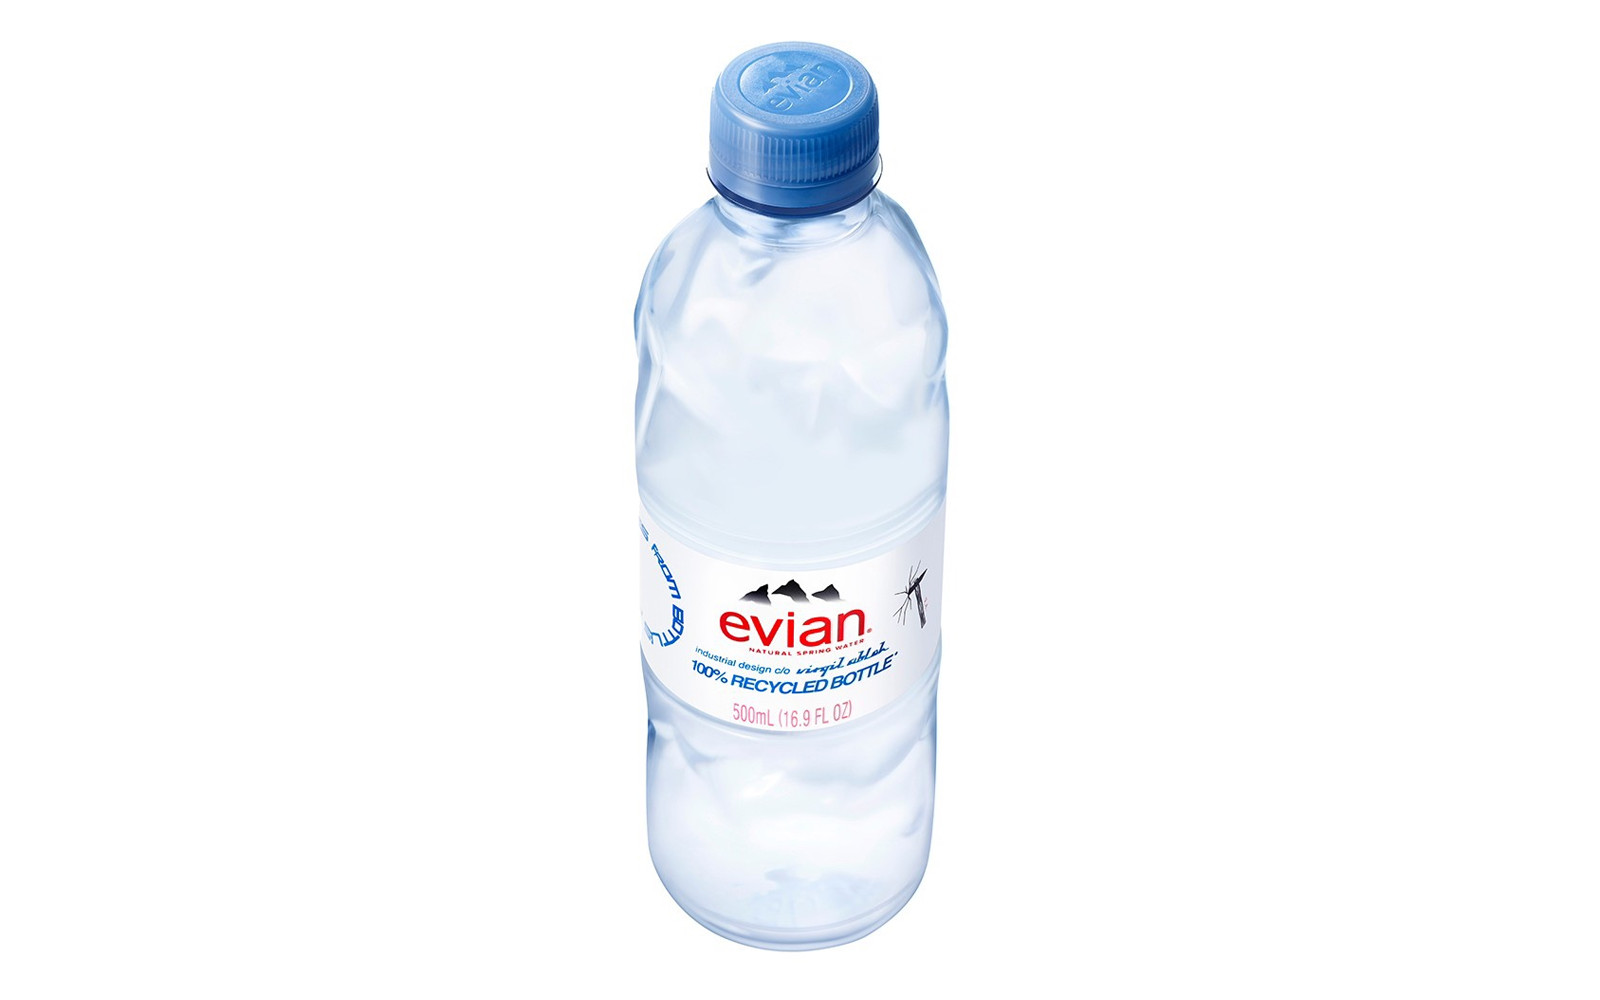 Virgil Abloh Evian water bottle 2021